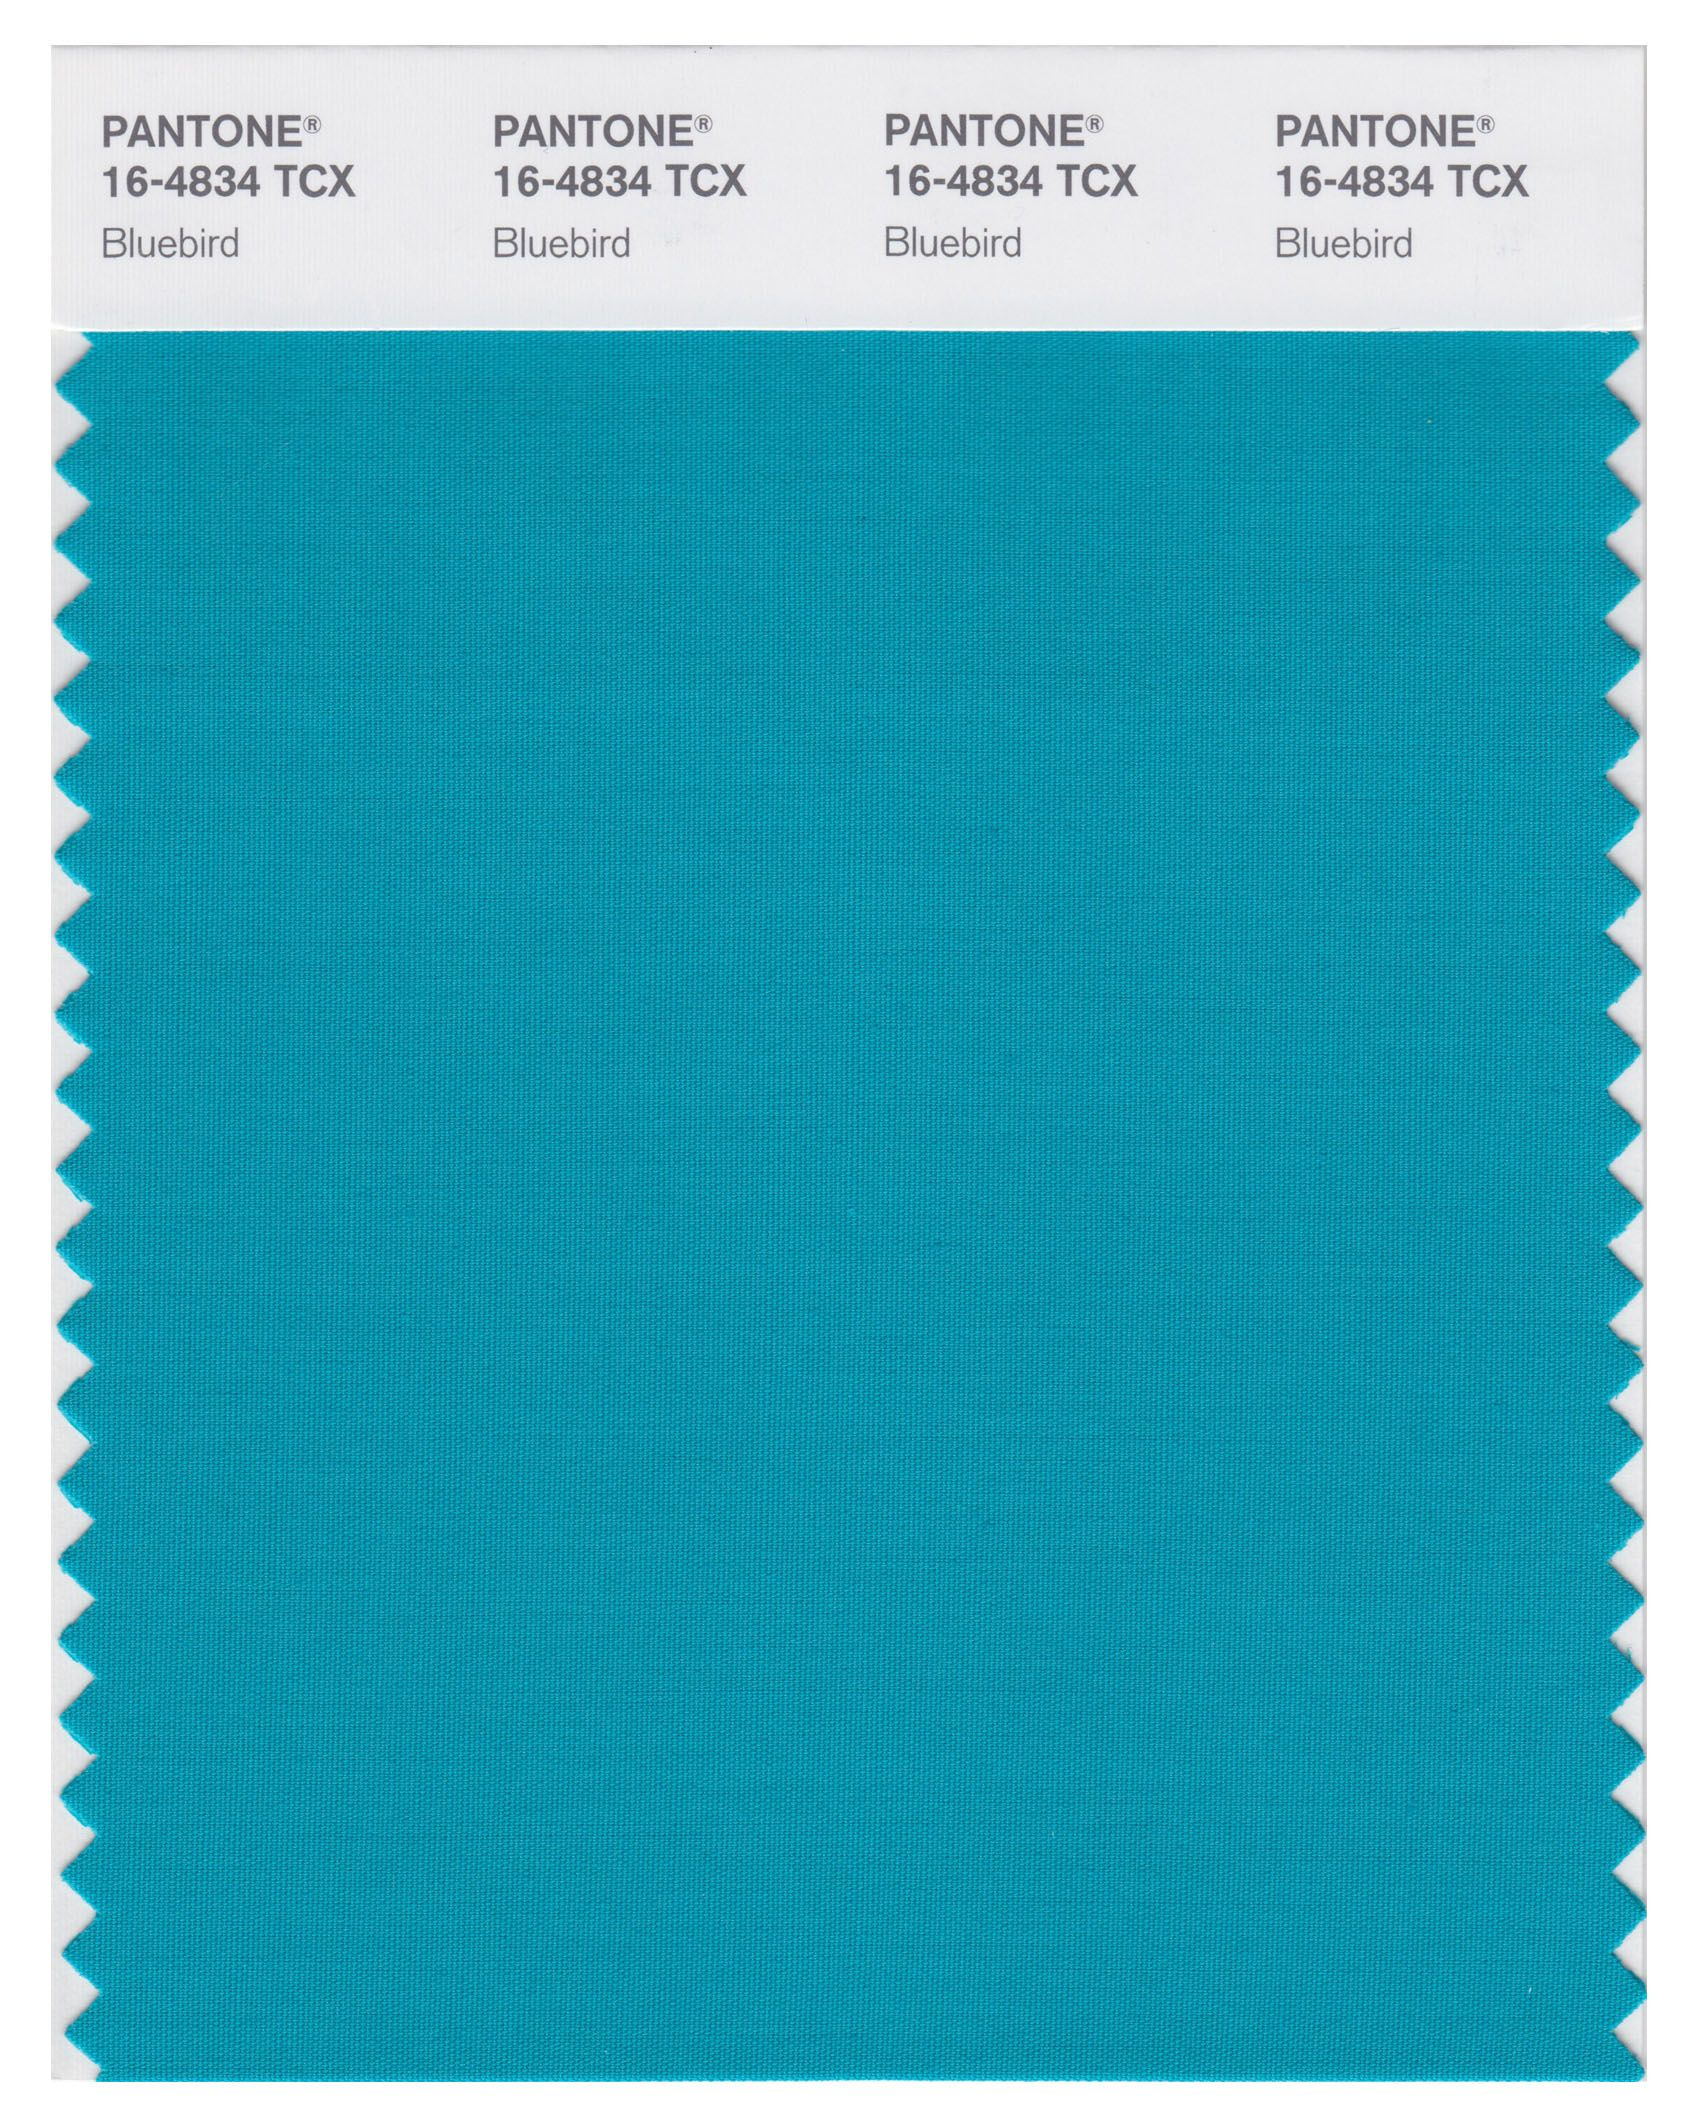 Pantone Smart 16 4834 Tcx Color Swatch Card Bluebird Magazine Cafe Nyc Usa